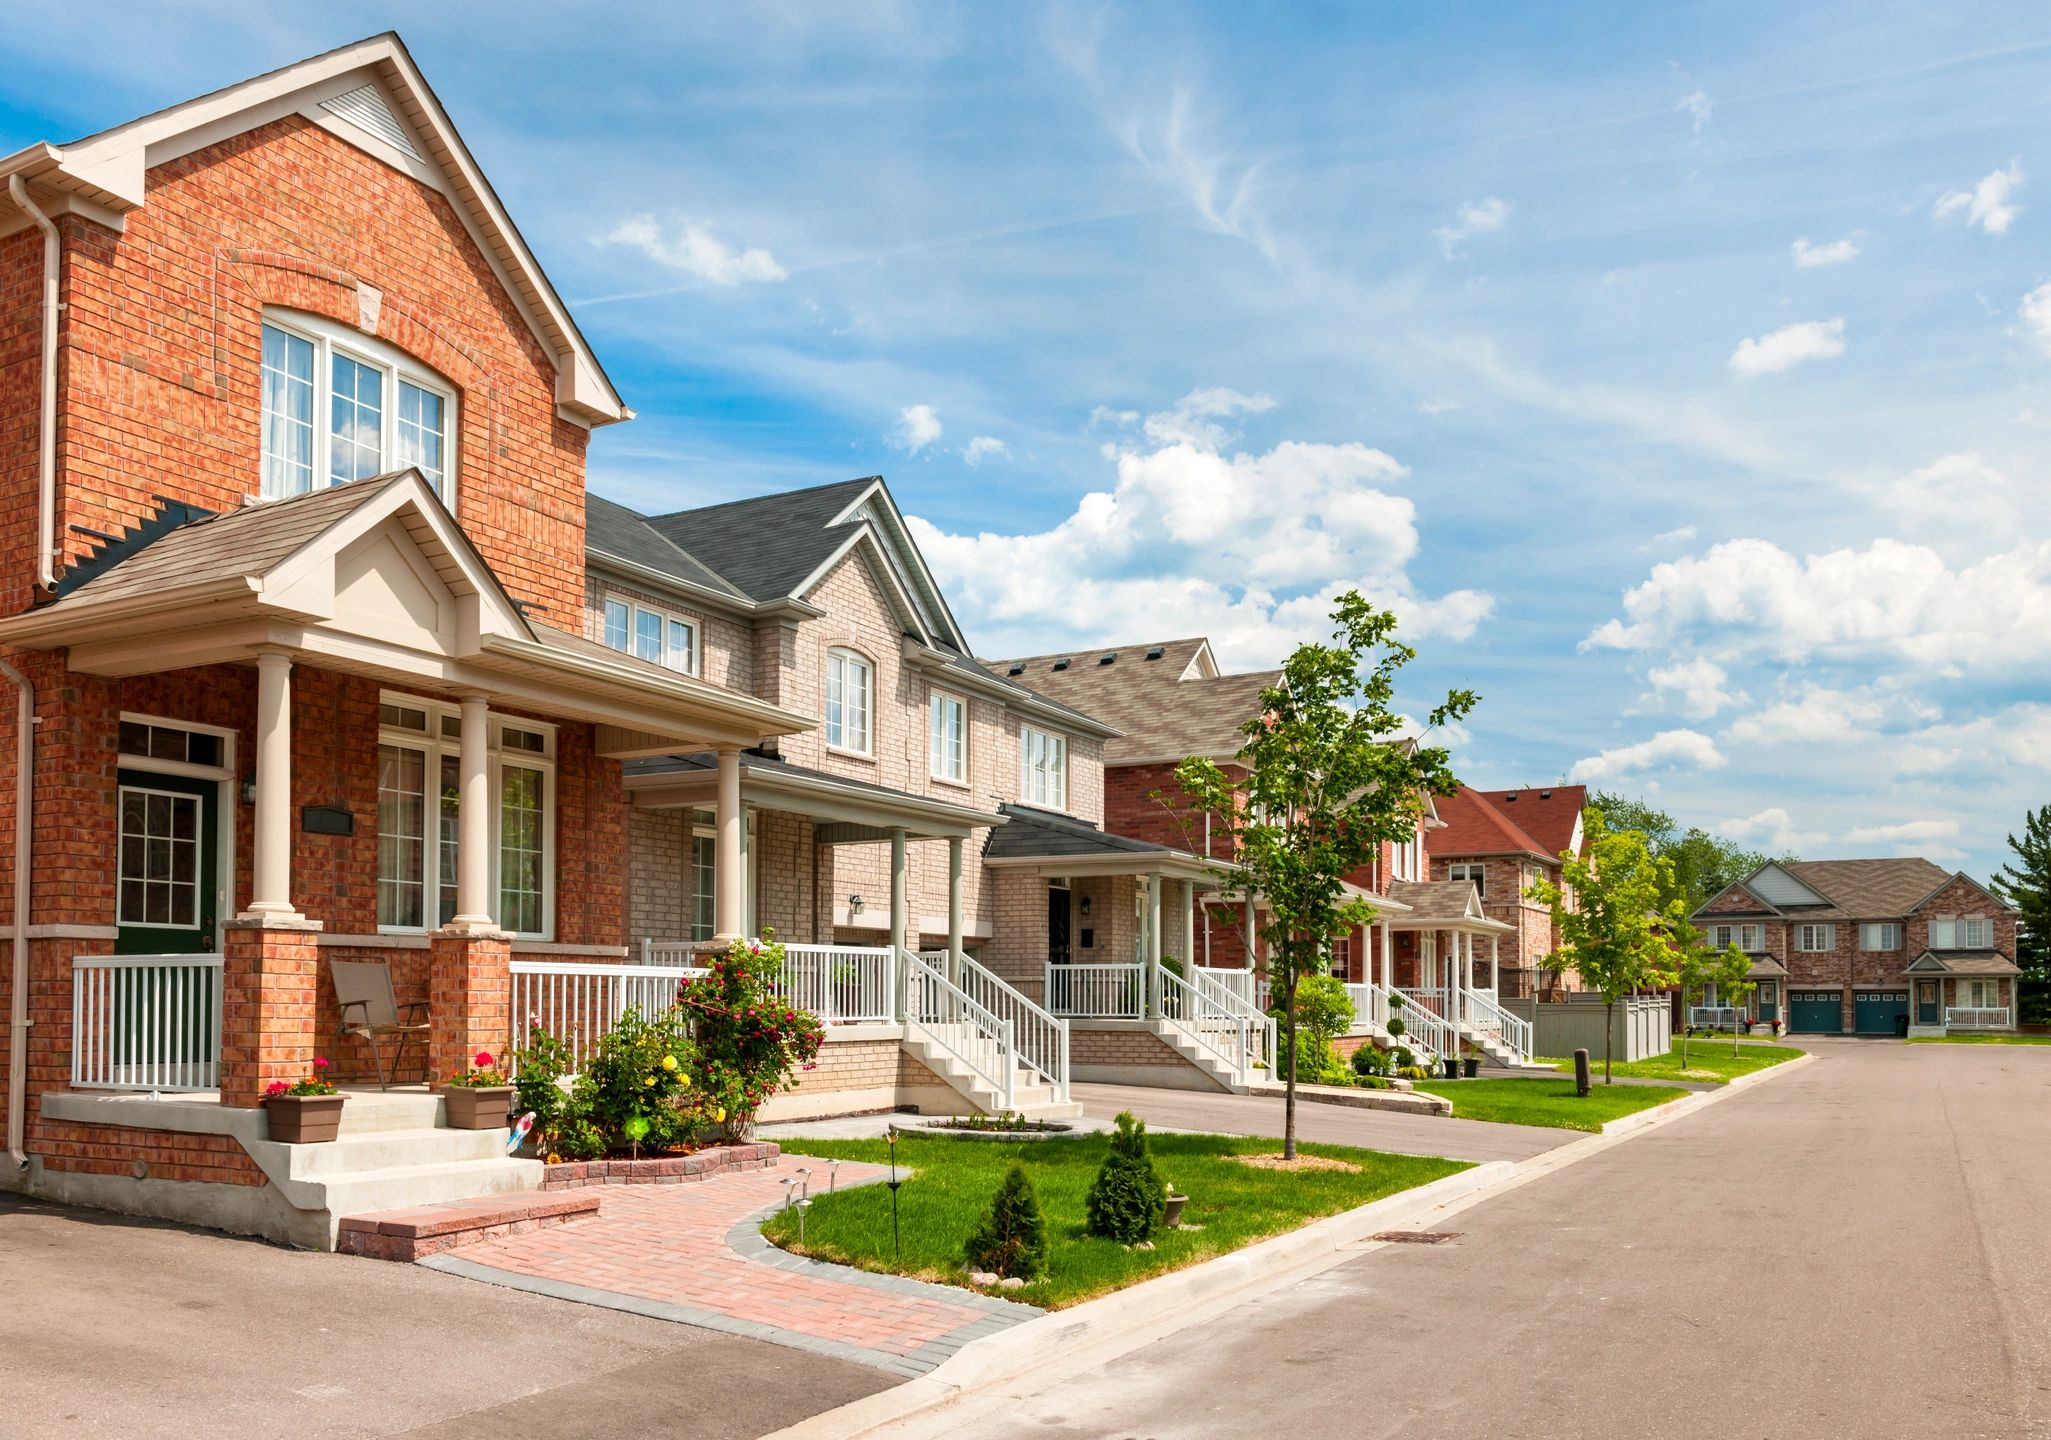 MVPS Realtors | Residential Real Estate Company